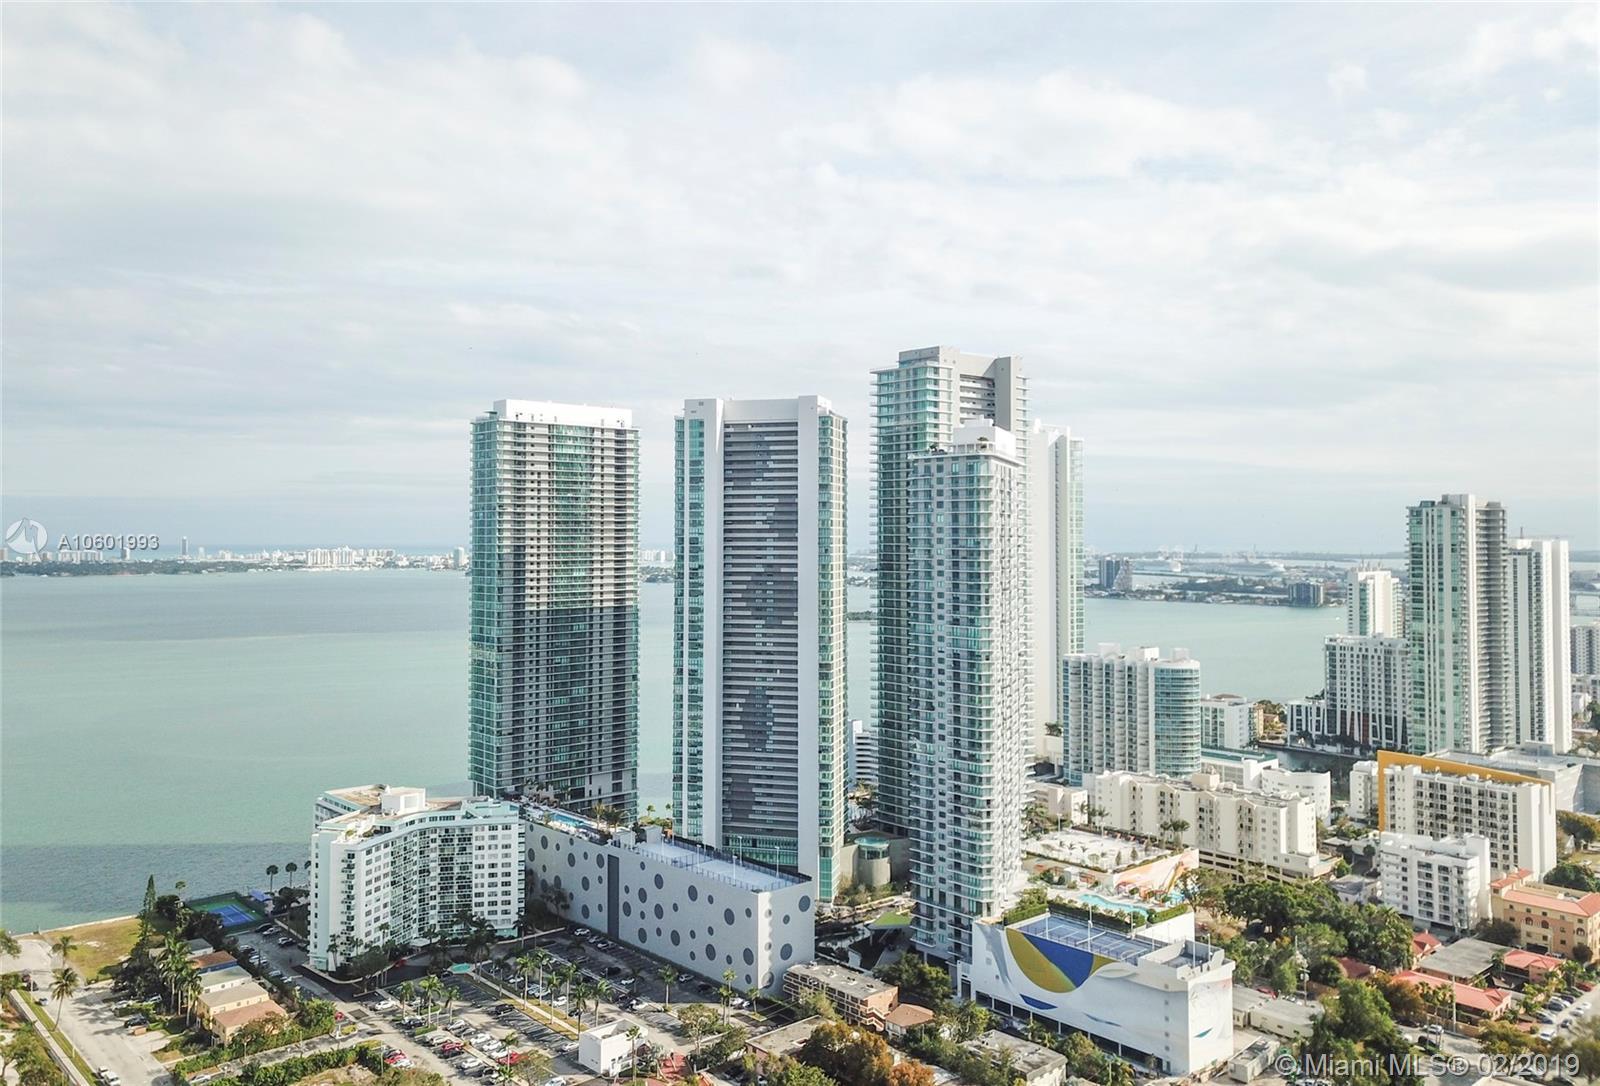 Paraiso Bay #Ph5204 - 650 NE 32 St #Ph5204, Miami, FL 33137